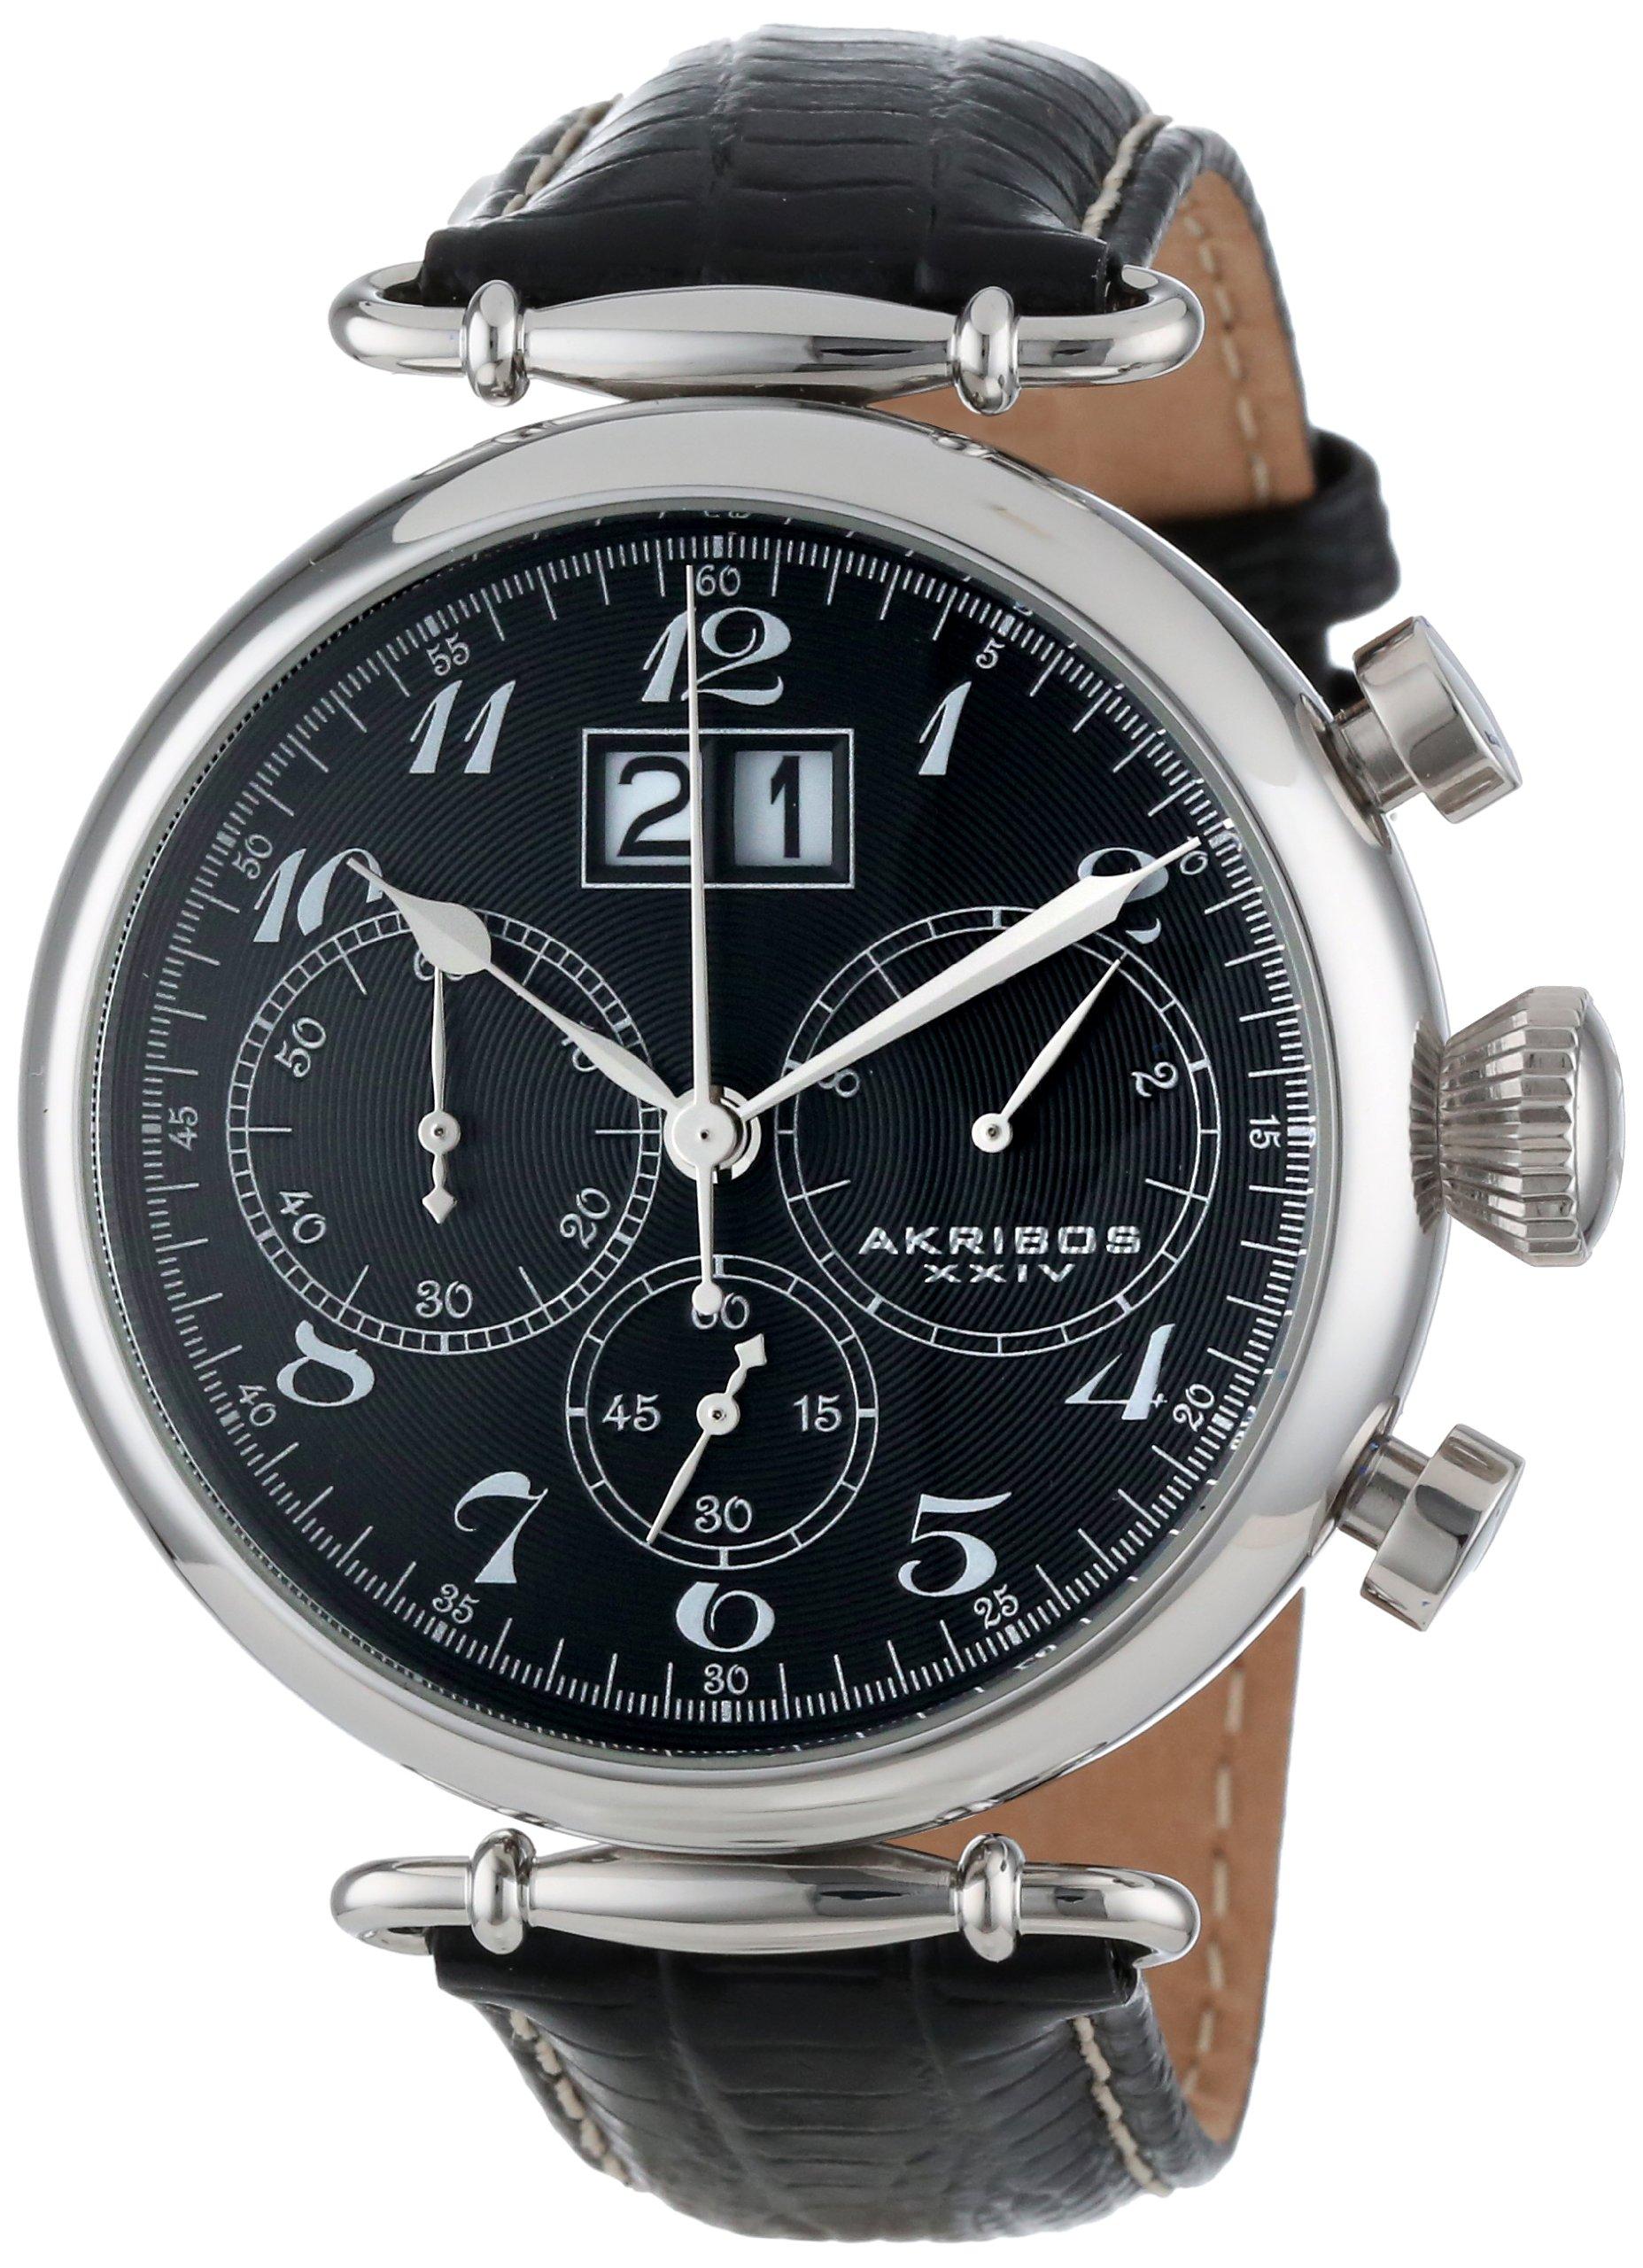 Akribos-XXIV-Herren-Analog-Quarz-Uhr-mit-Leder-Armband-AK628BK